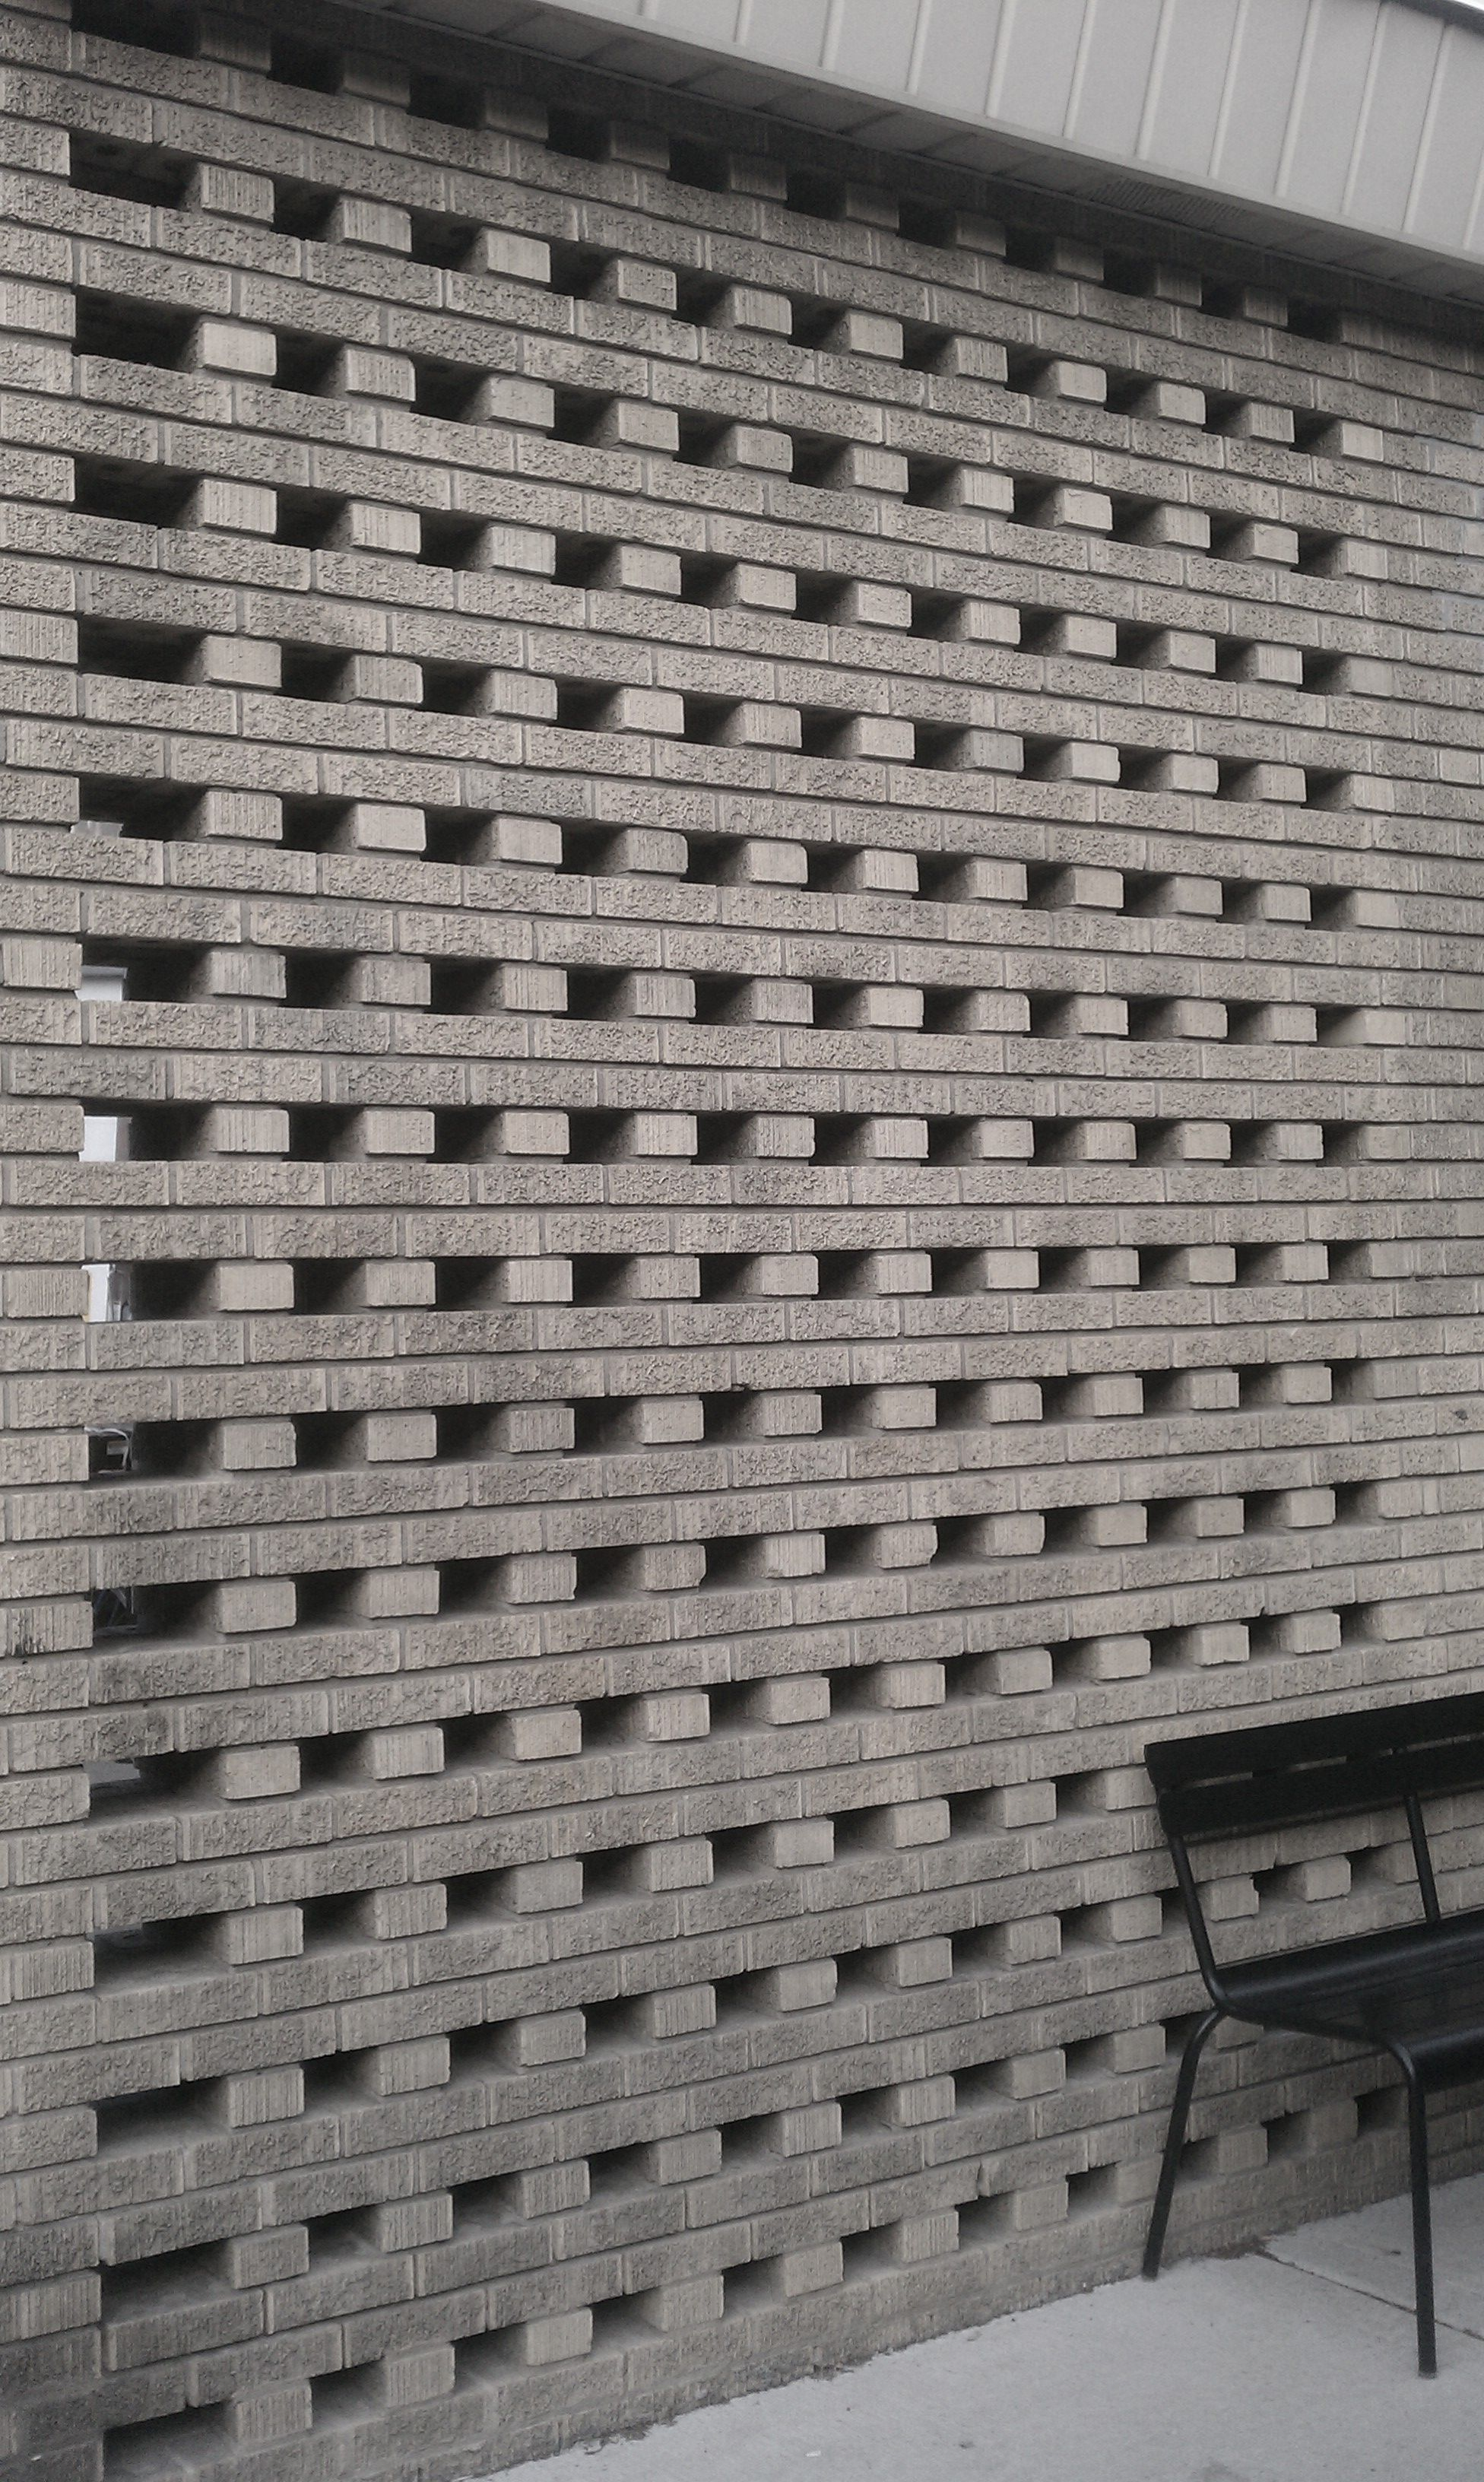 Lattice Brick Work In Chicago Starbucks Lakeview Masonry Austin Flats Rene Black Hitam 37